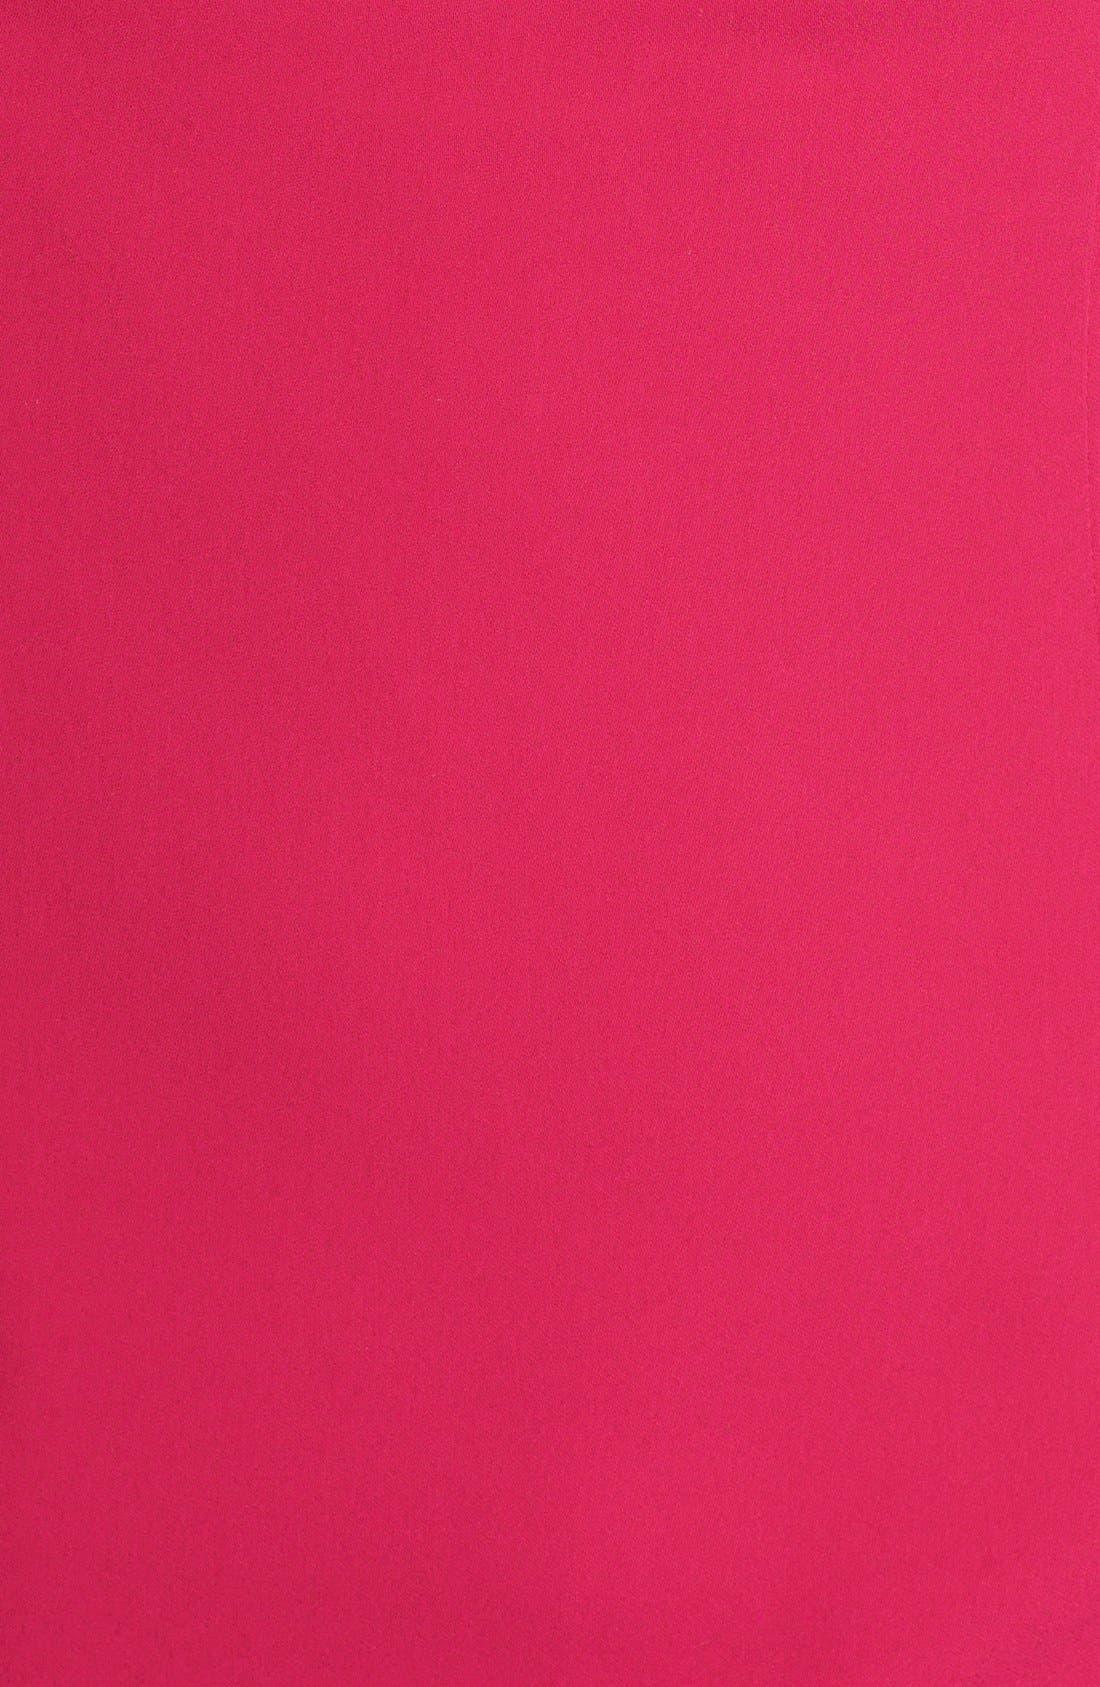 Alternate Image 3  - T Tahari 'Persia' Sheath Dress